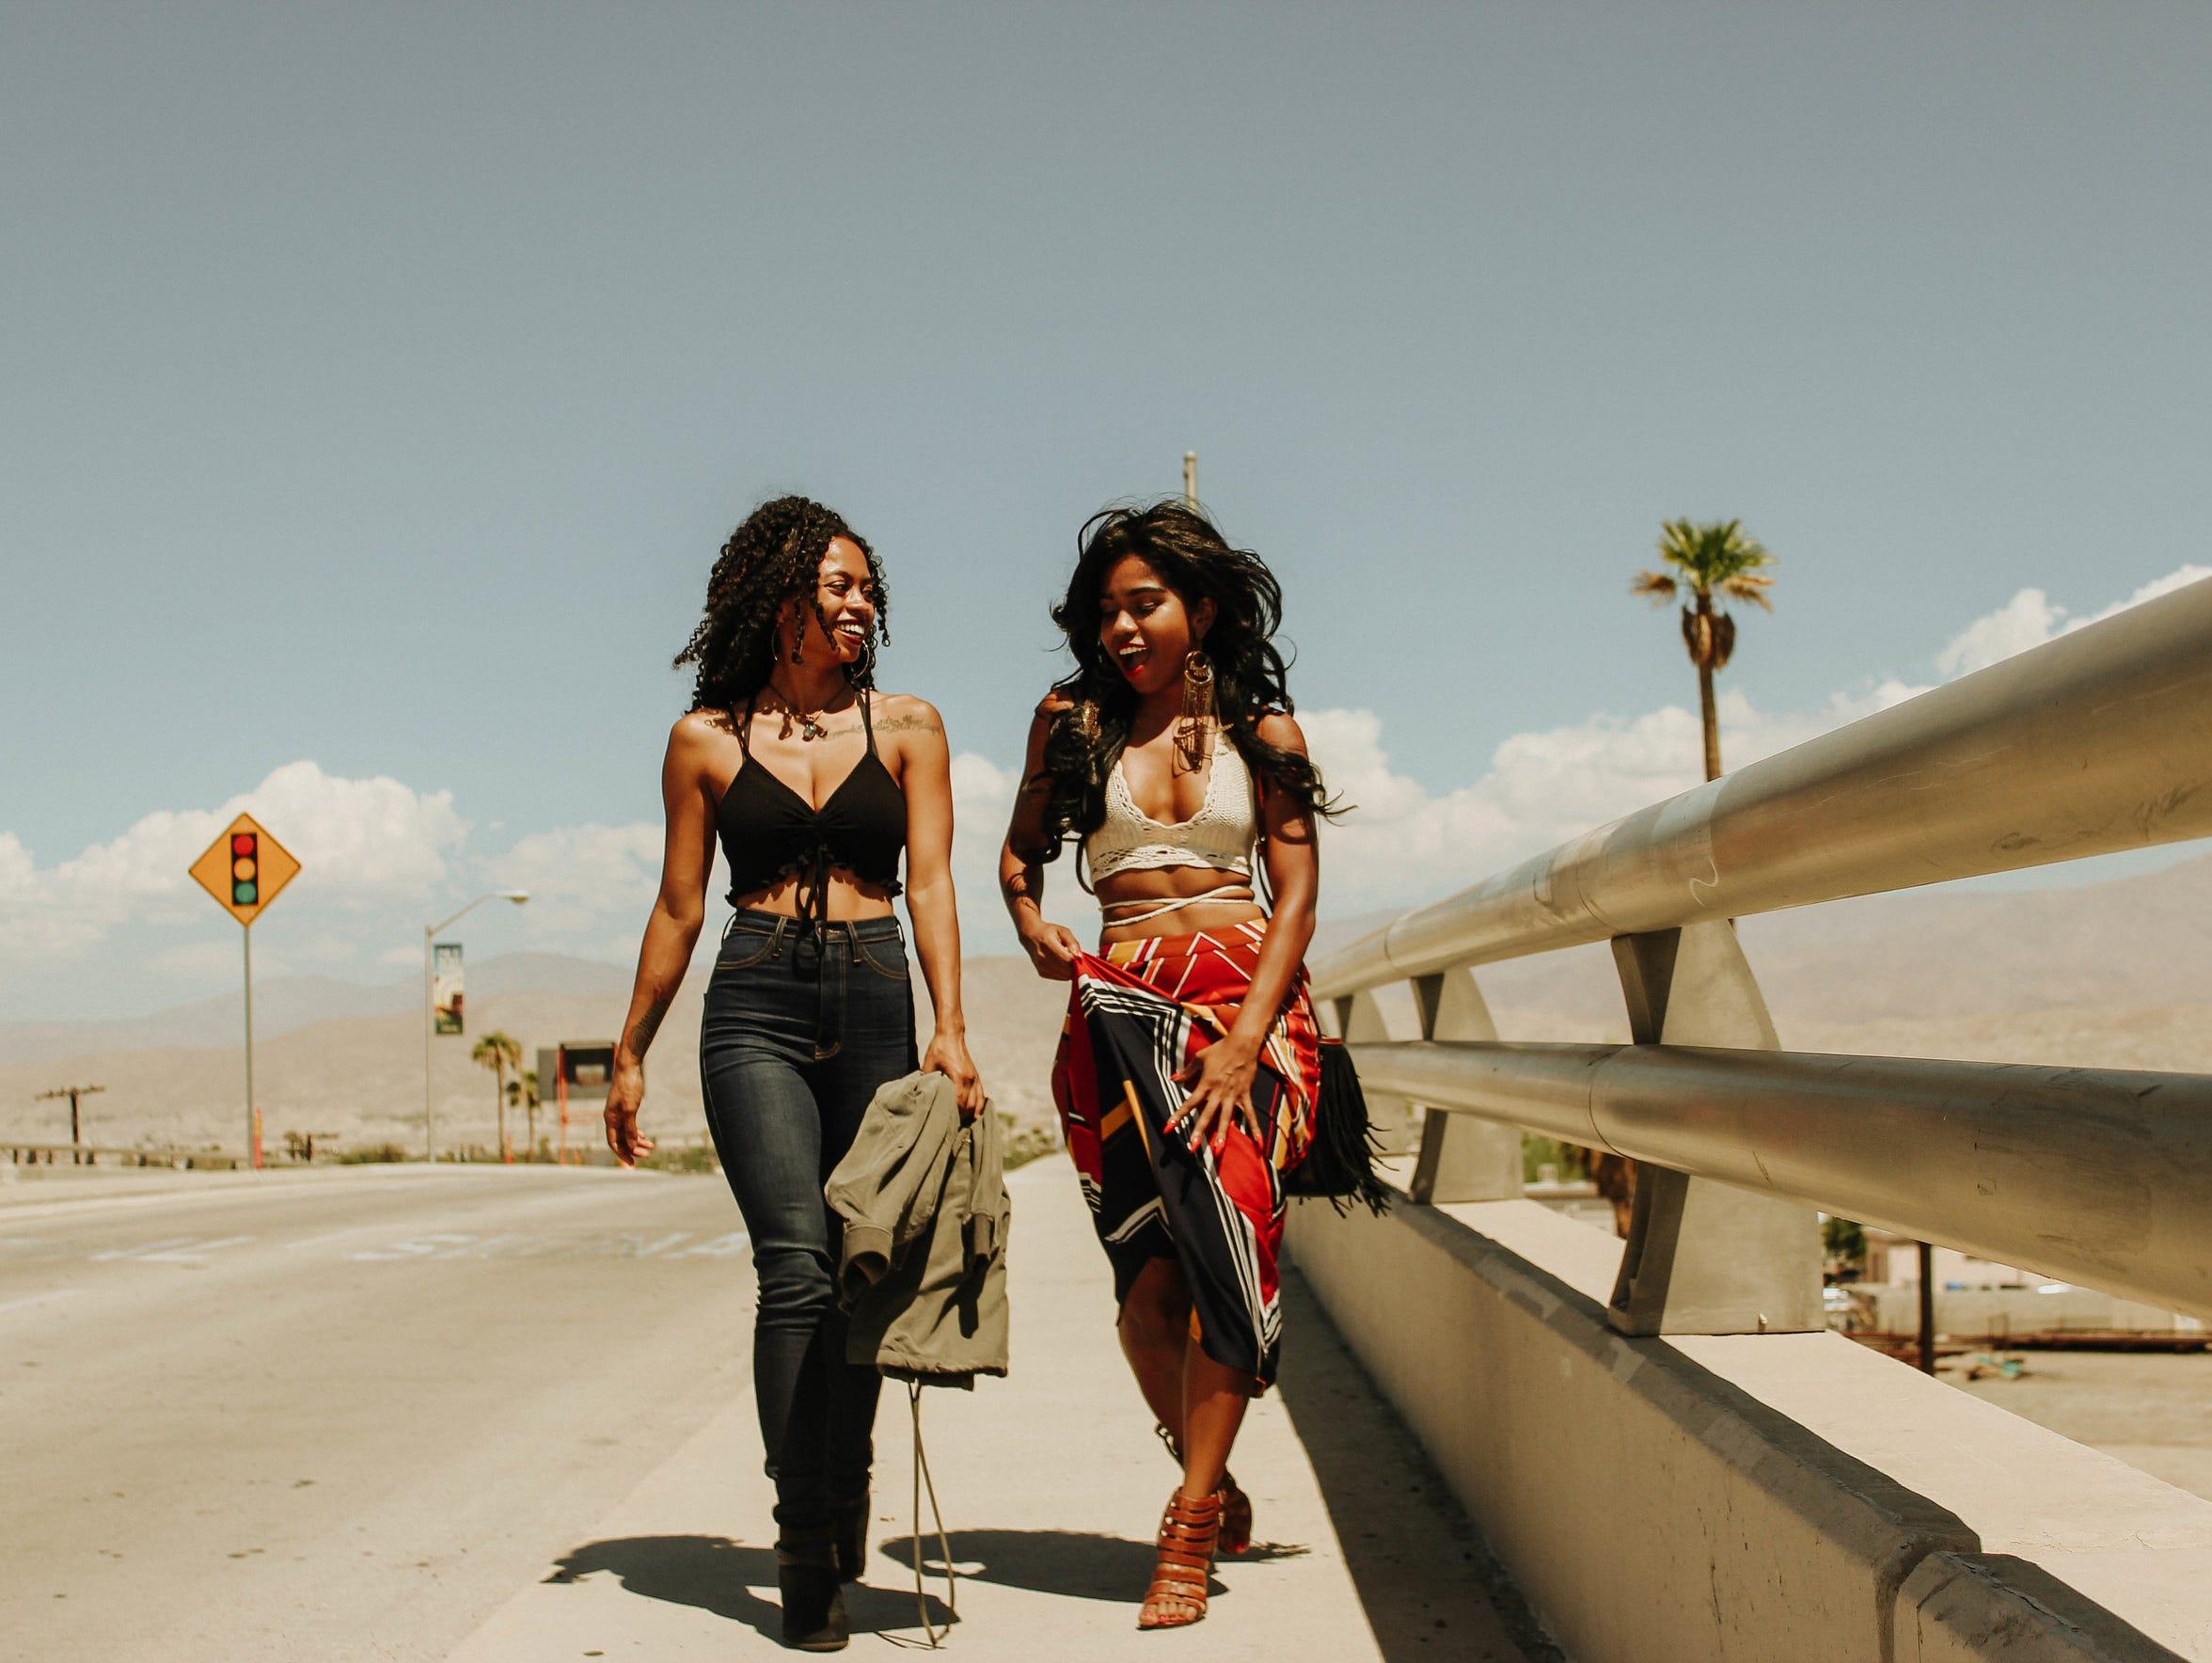 On Porsia (left): Fashion Nova top and jeans, City